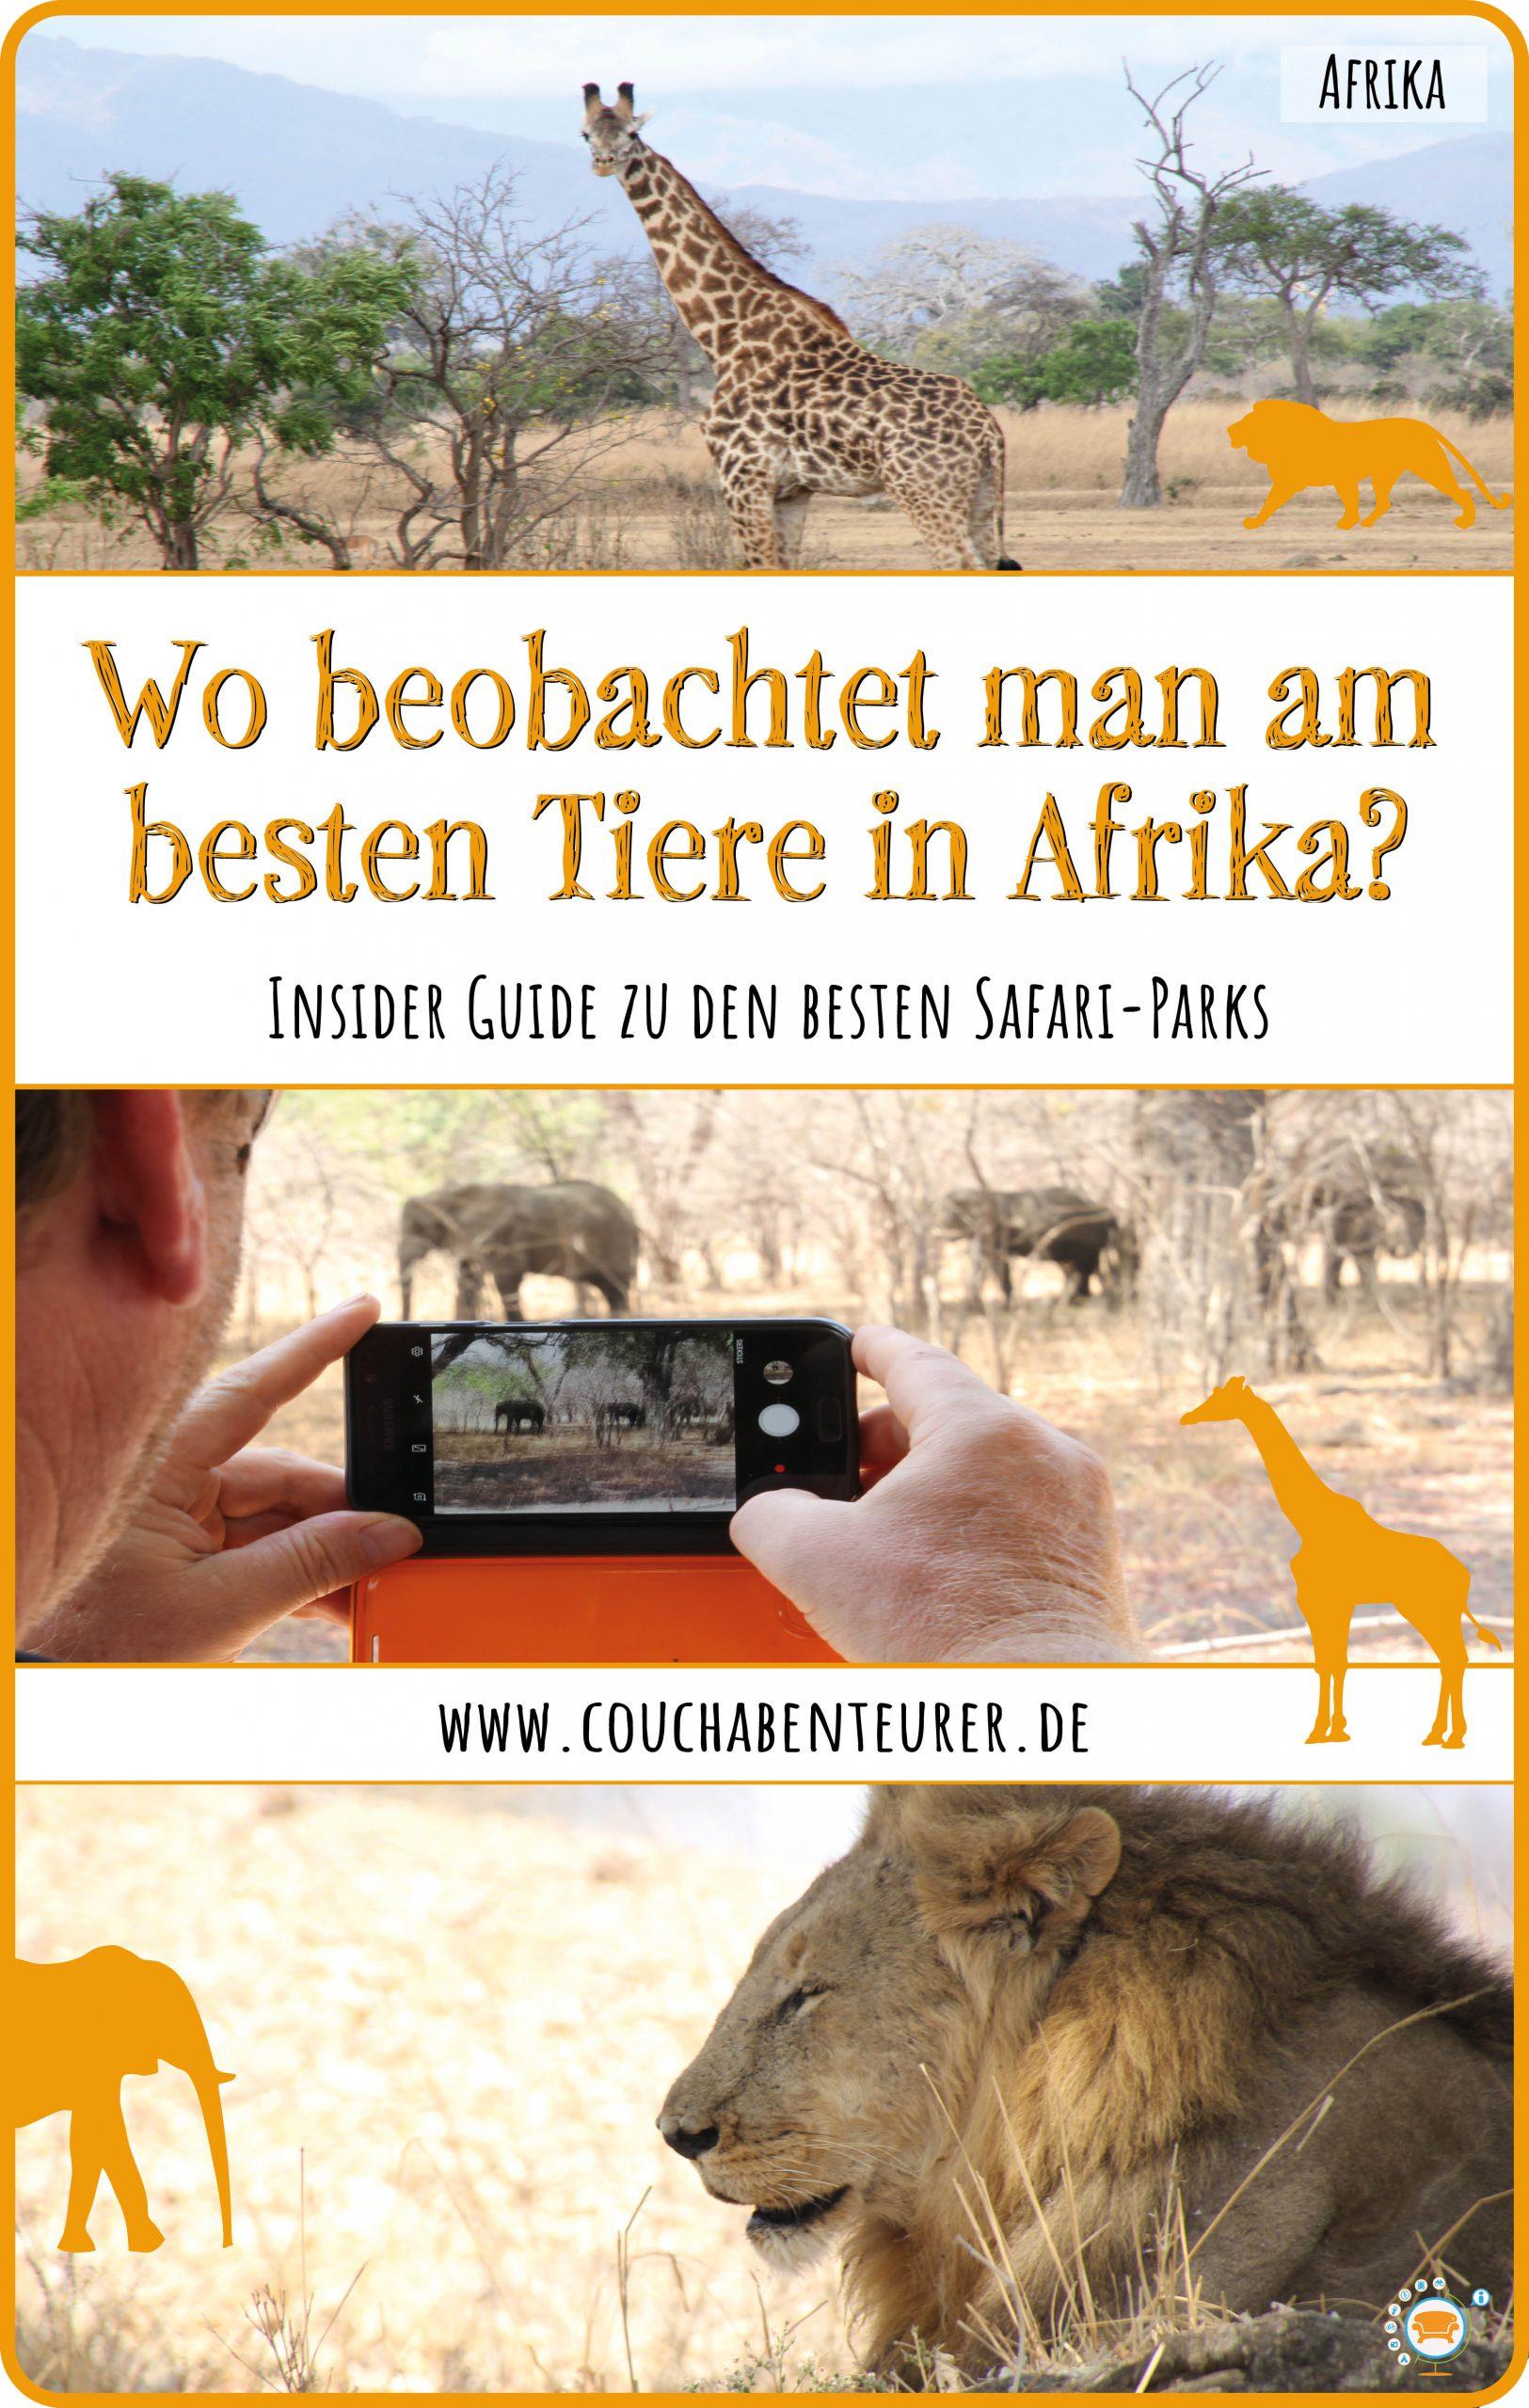 wo-beobachtet-man-am-besten-tiere-in-afrika-insider-guide-besten-safari-parks_Pinterest